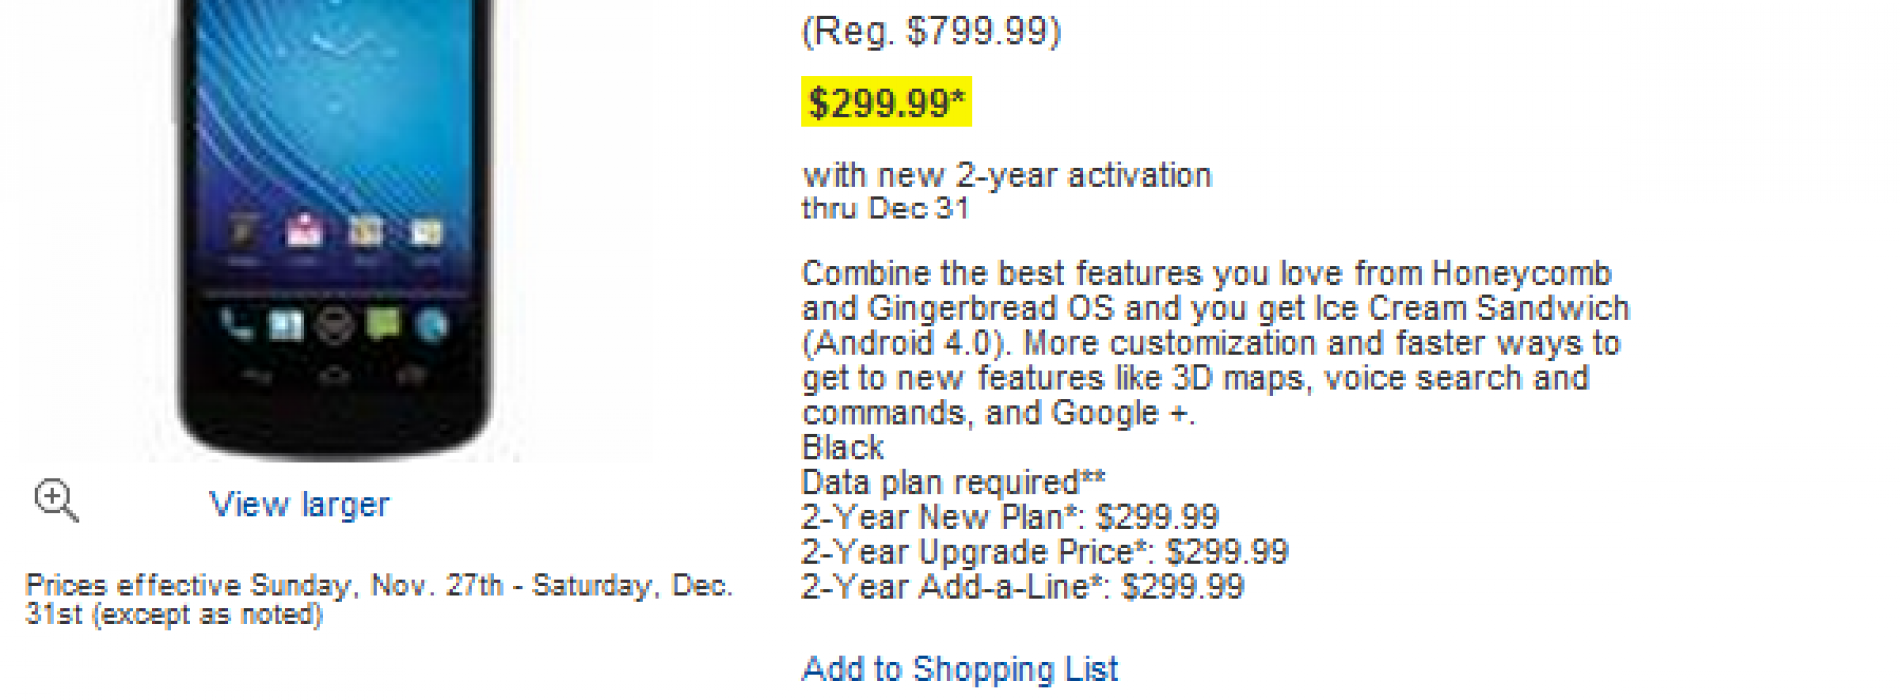 Verizon's Nexus Prime found on Best Buy Shop Local website